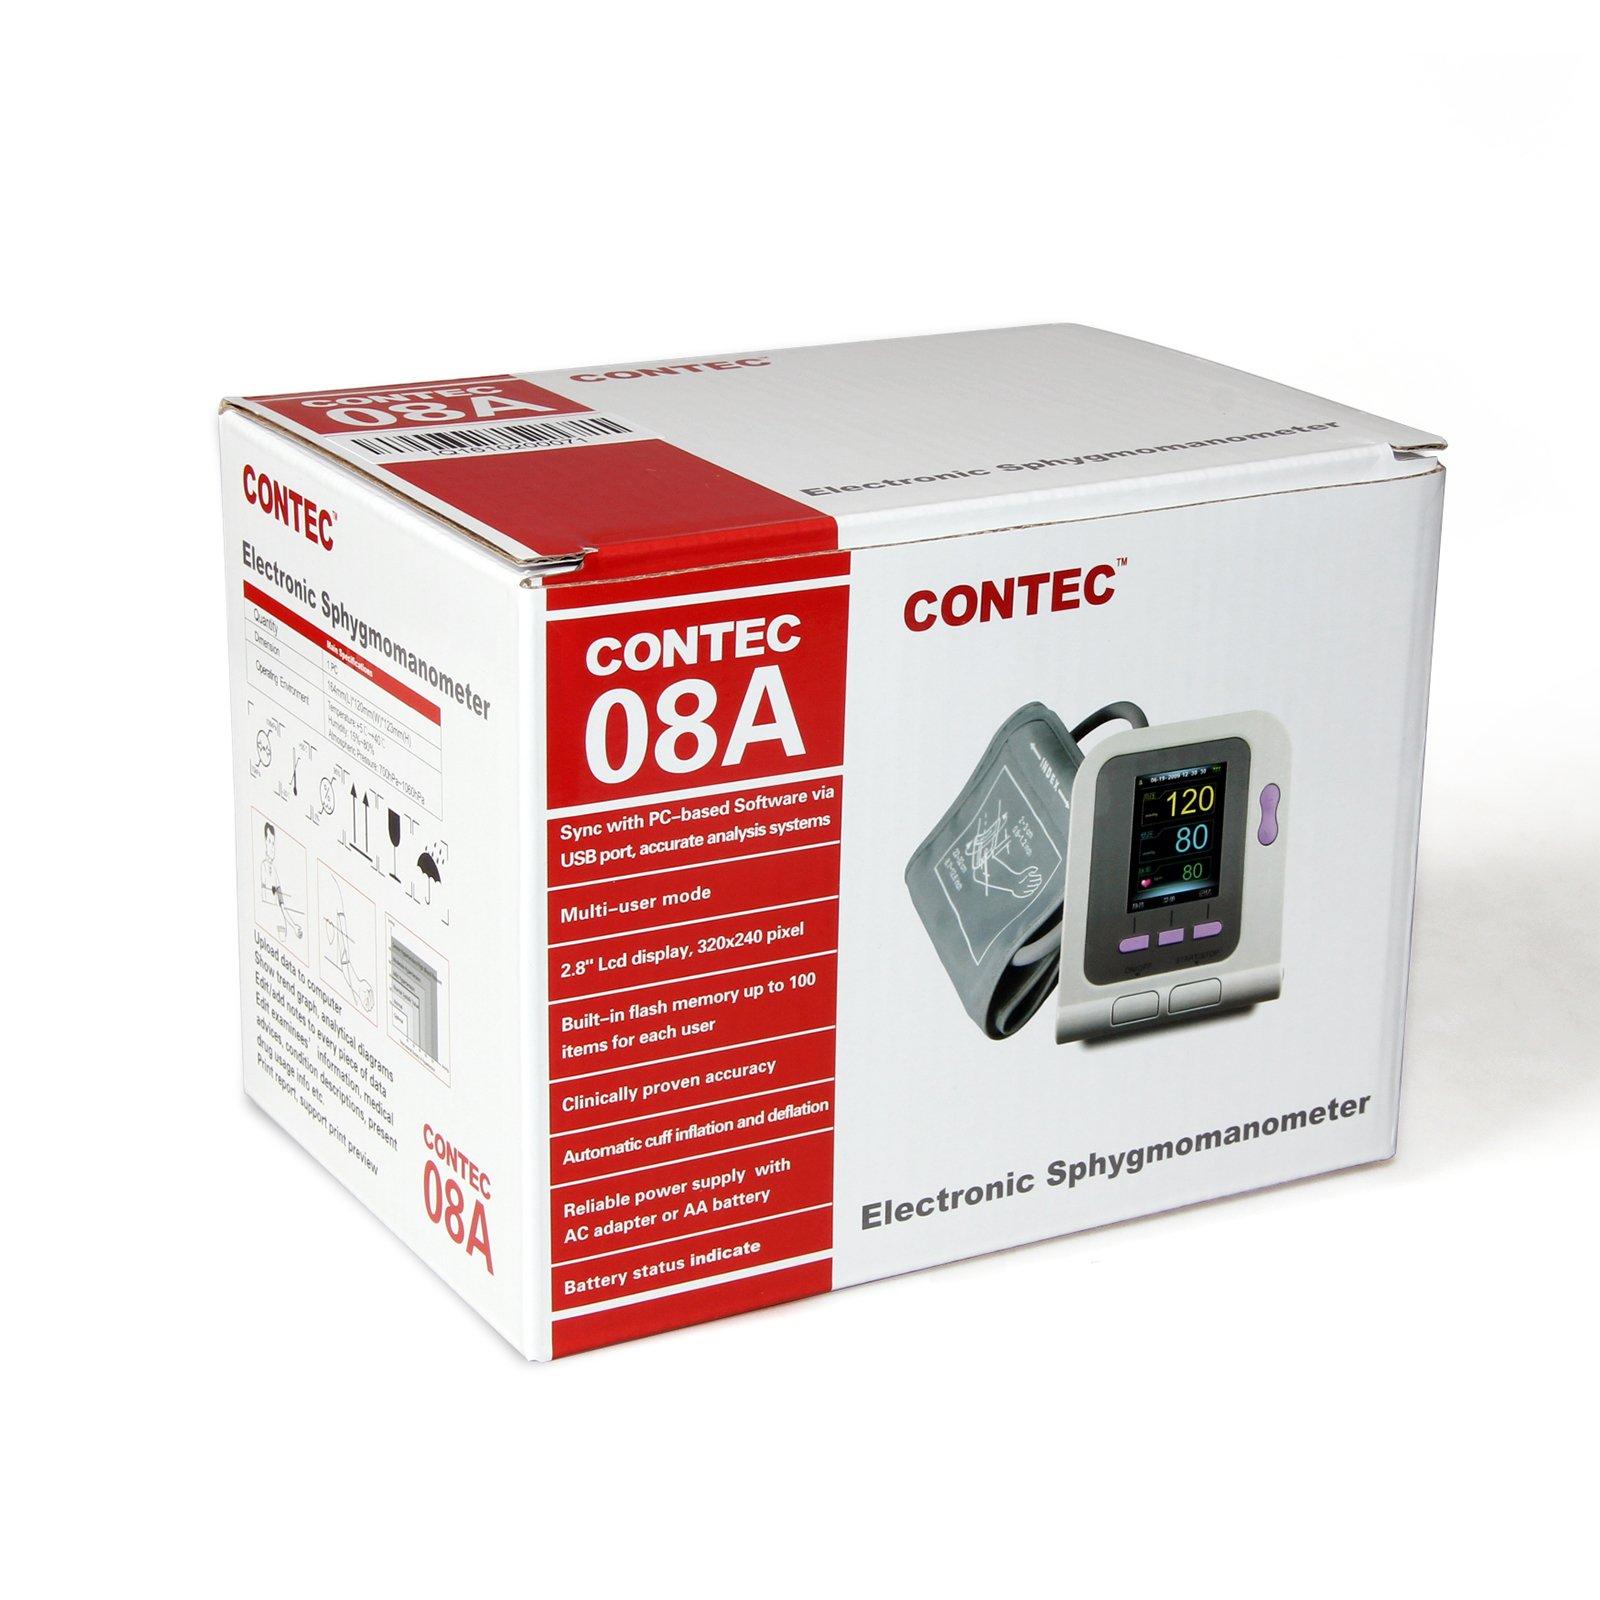 CONTEC08A-VET Digital Veterinary Blood Pressure Monitor NIBP Cuff,Dog/Cat/Pets (CONTEC08A-VET with 3 Cuffs) by CONTEC